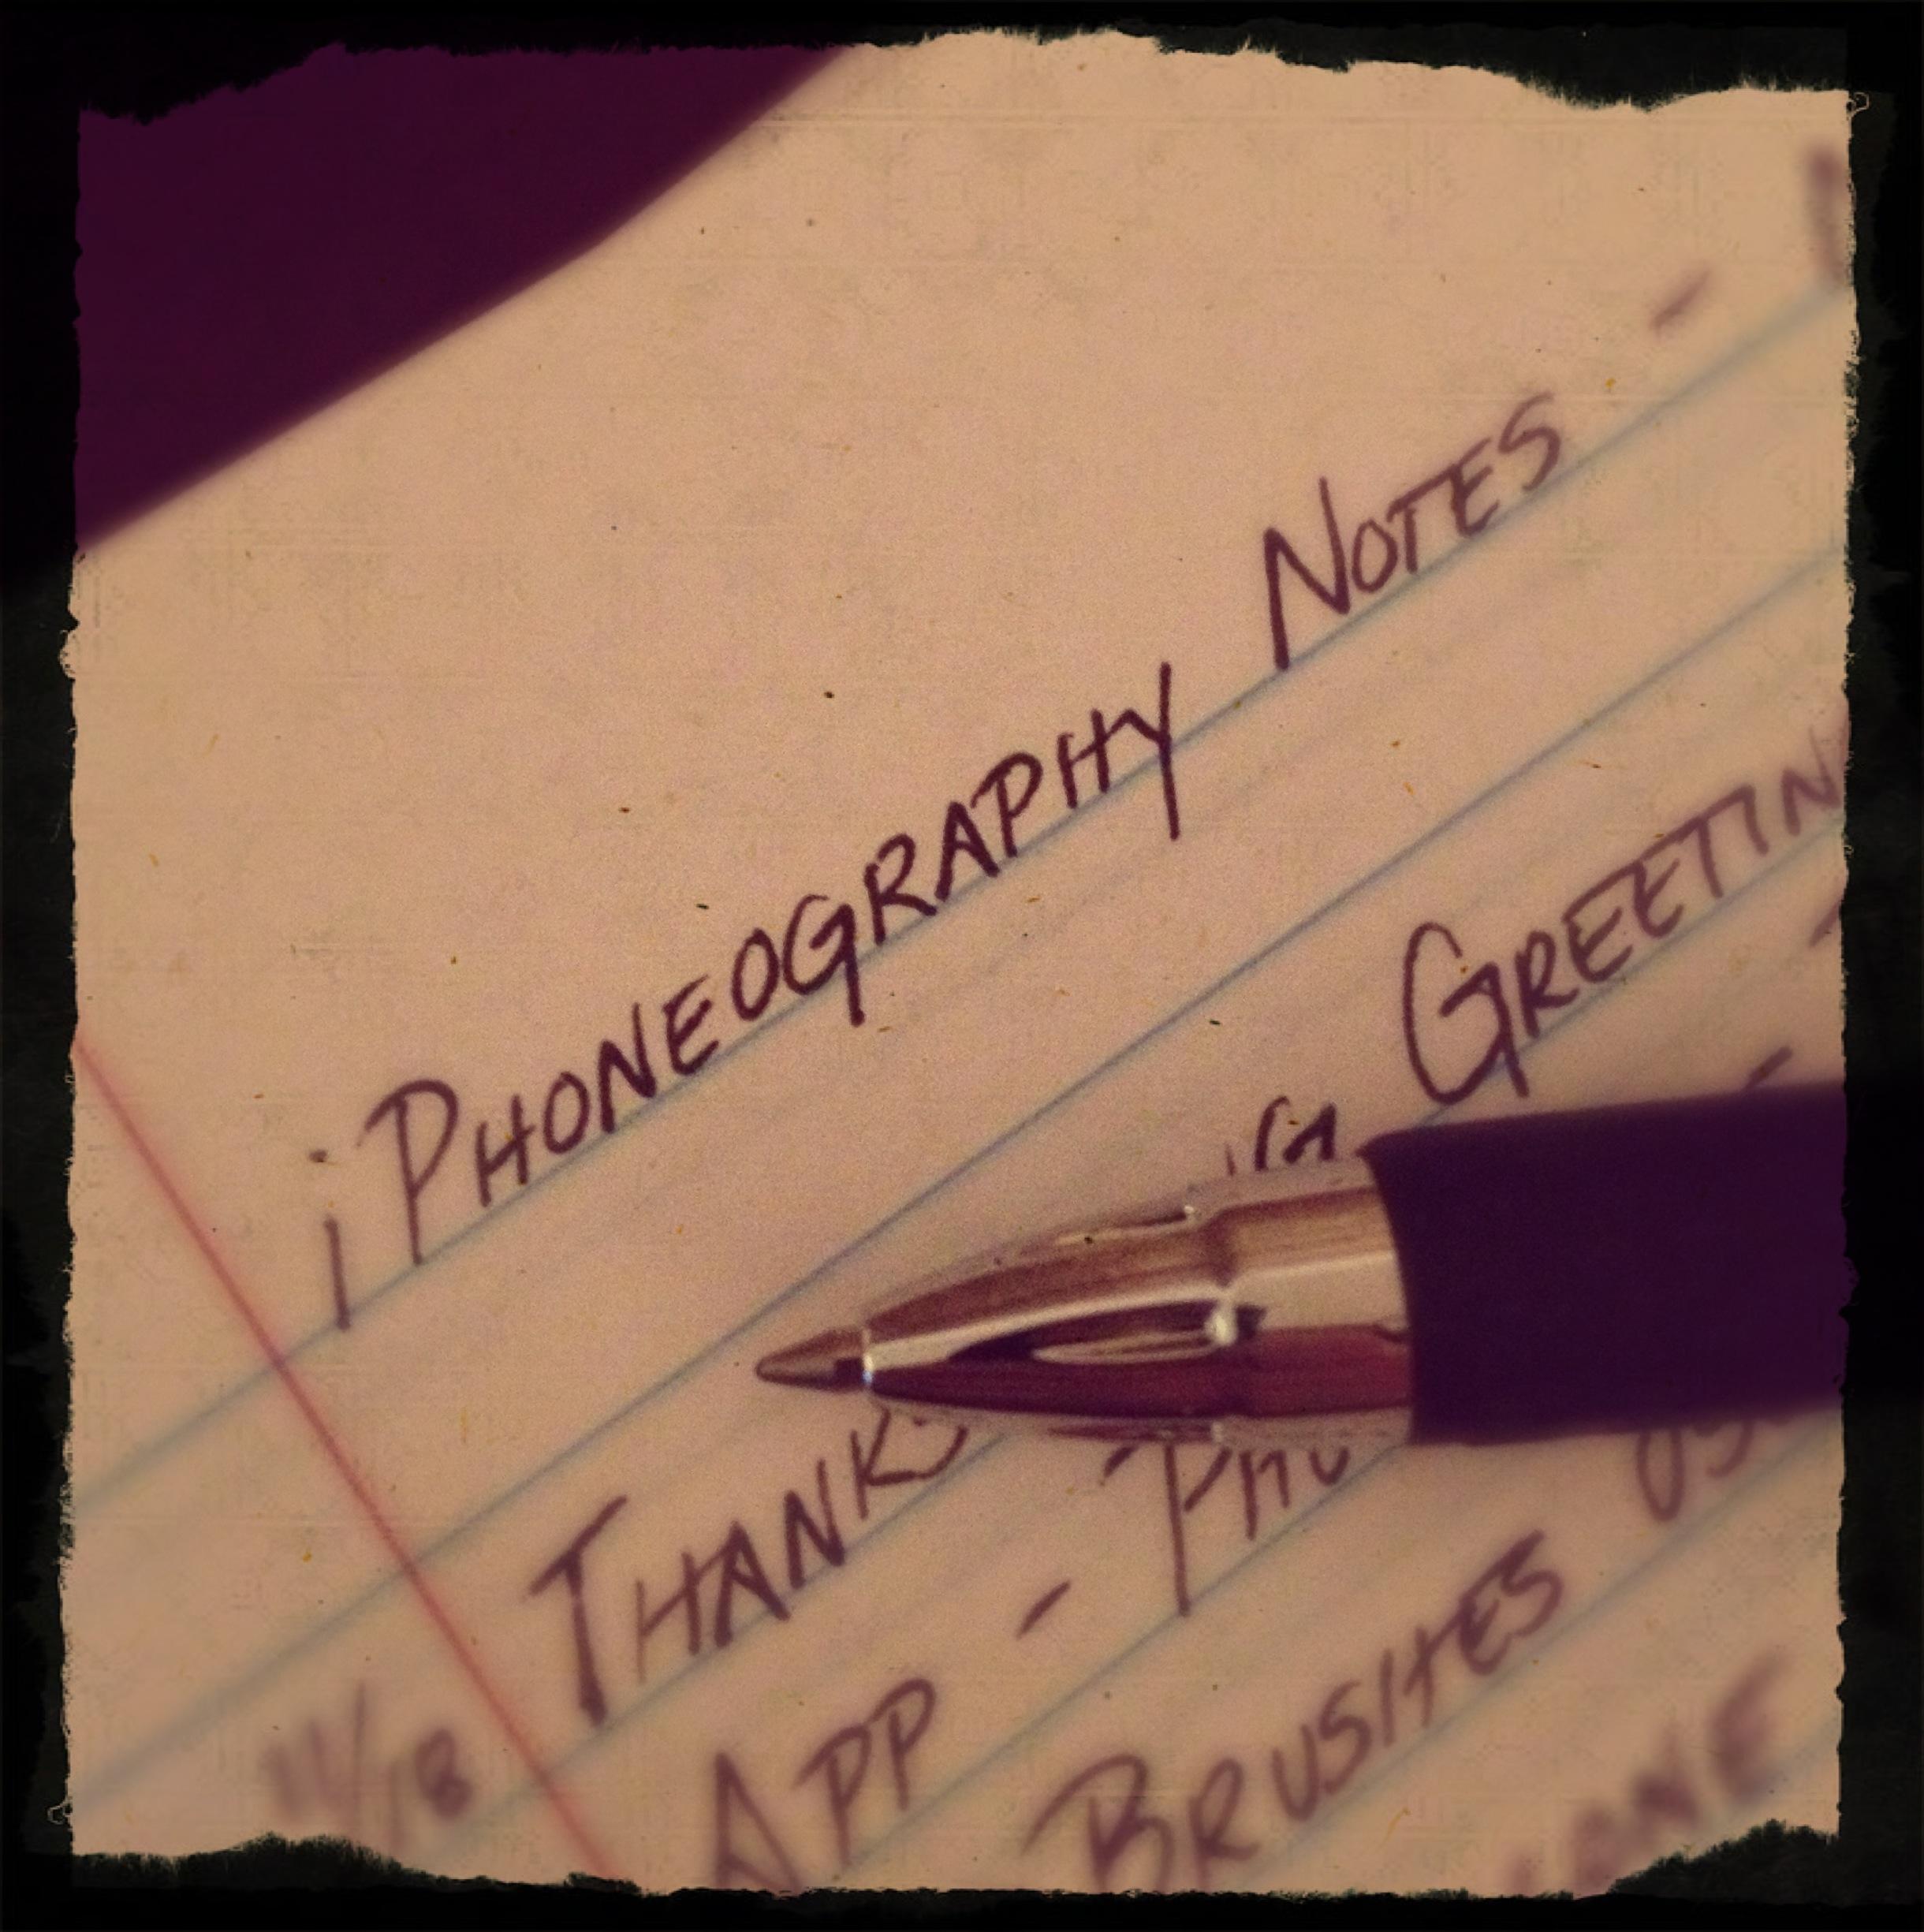 iPhoneography Notebook byJennifer Lynn Bishop